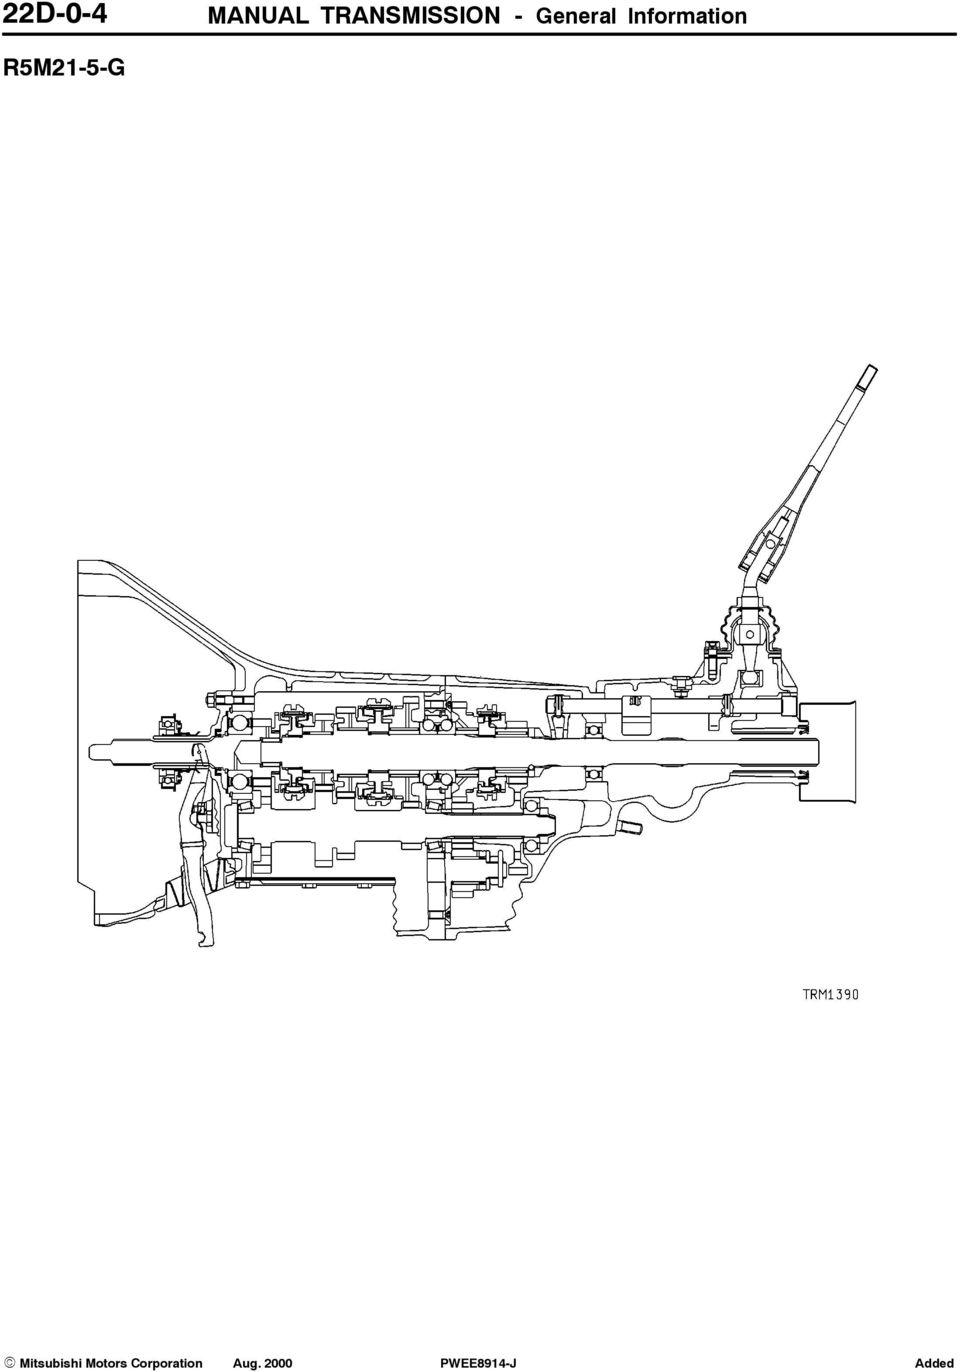 medium resolution of 5 manual transmission general information 22d 0 5 r5m21 5 p